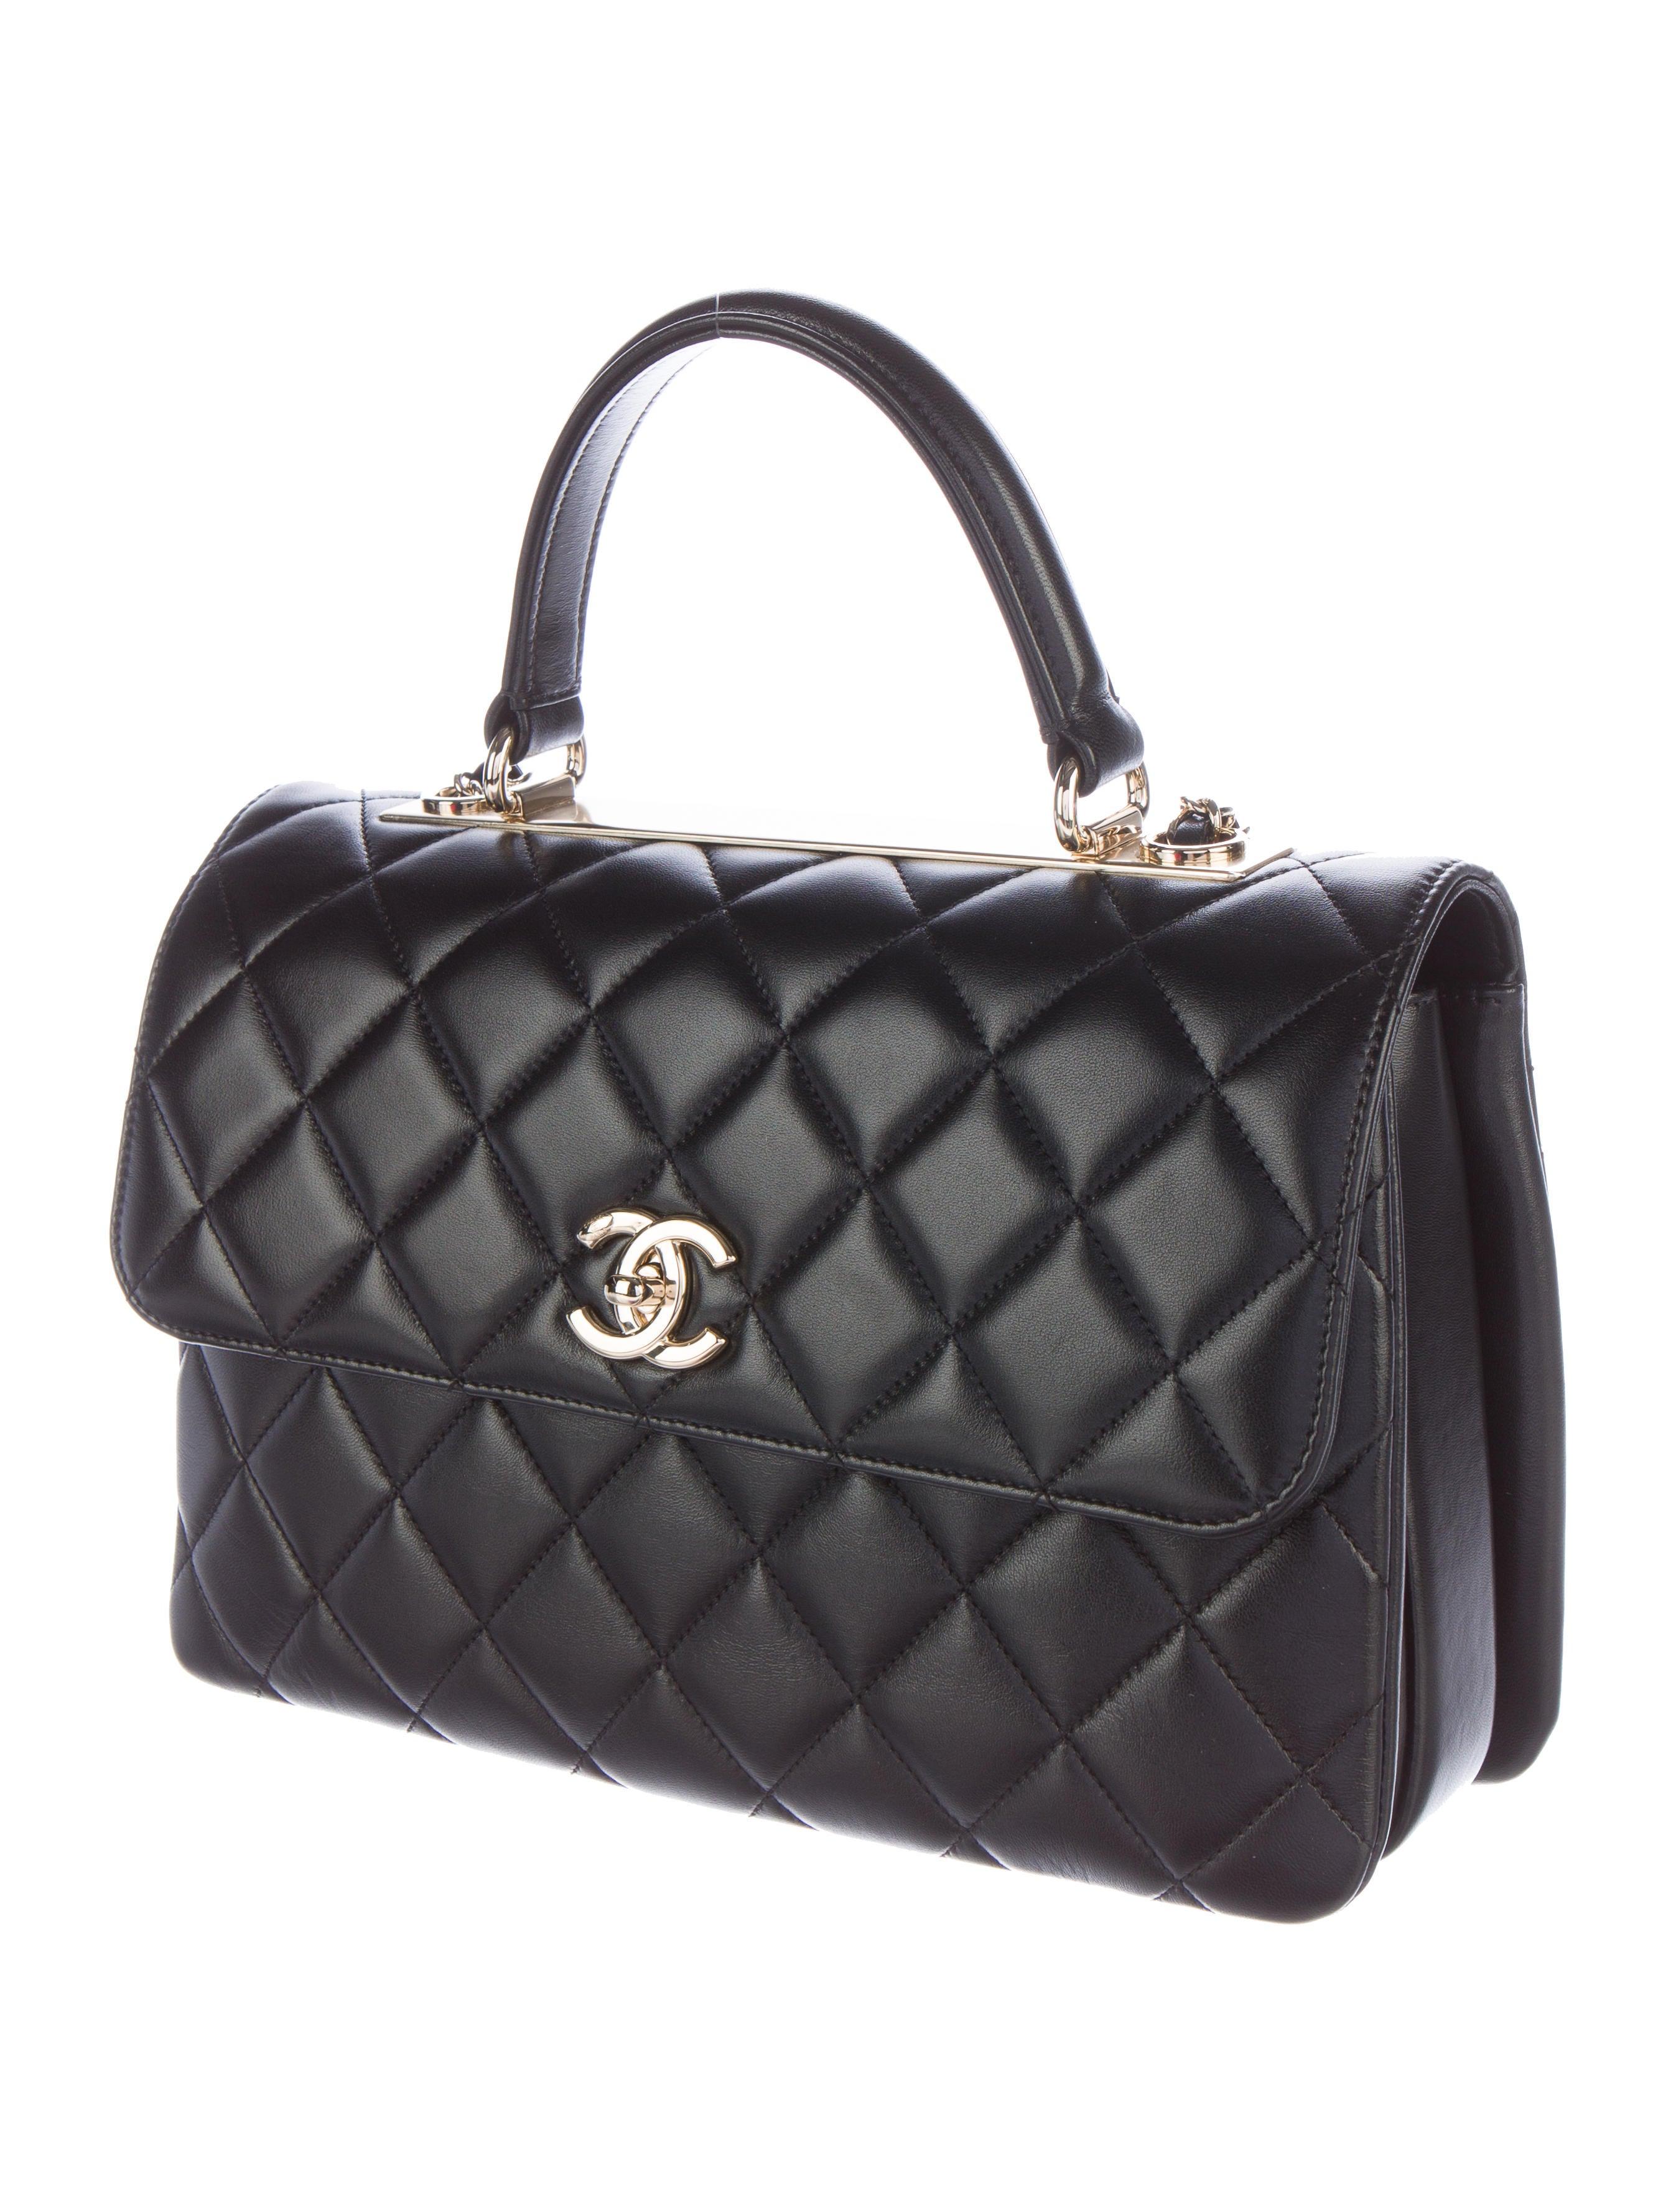 Chanel 2016 Large Trendy CC - Handbags